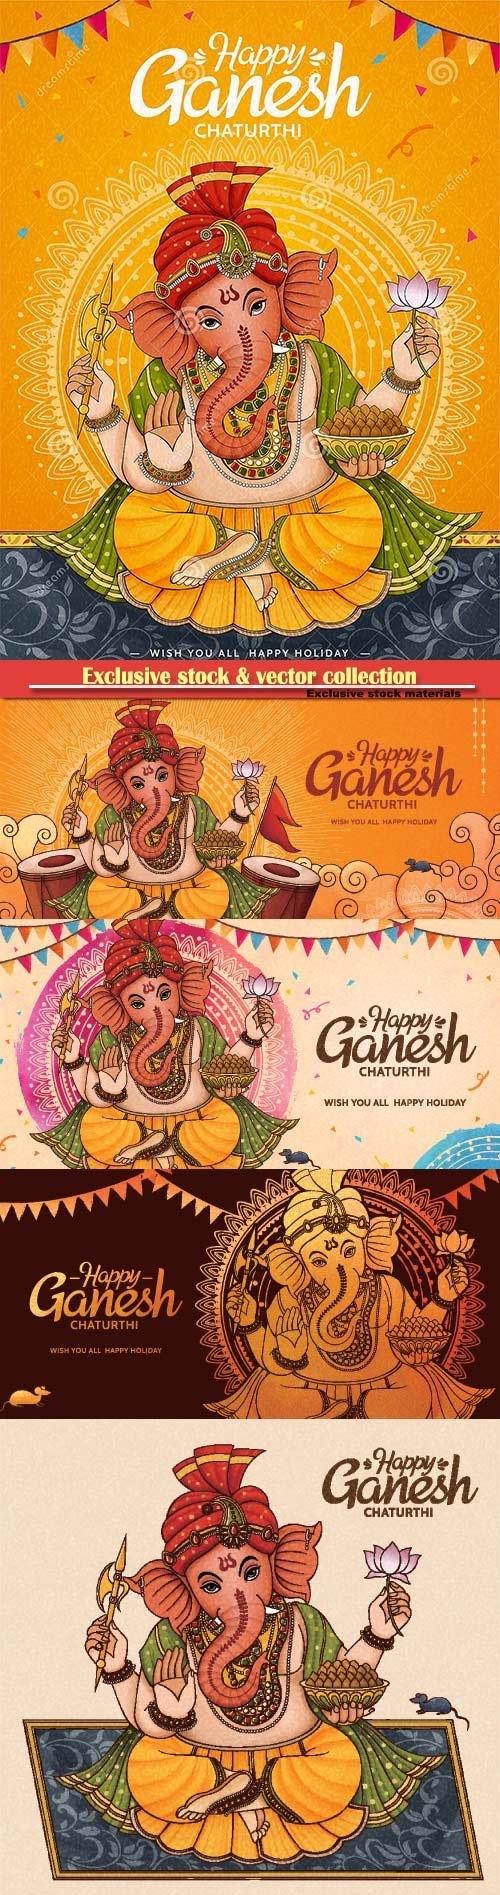 Happy Ganesh Chaturthi poster design